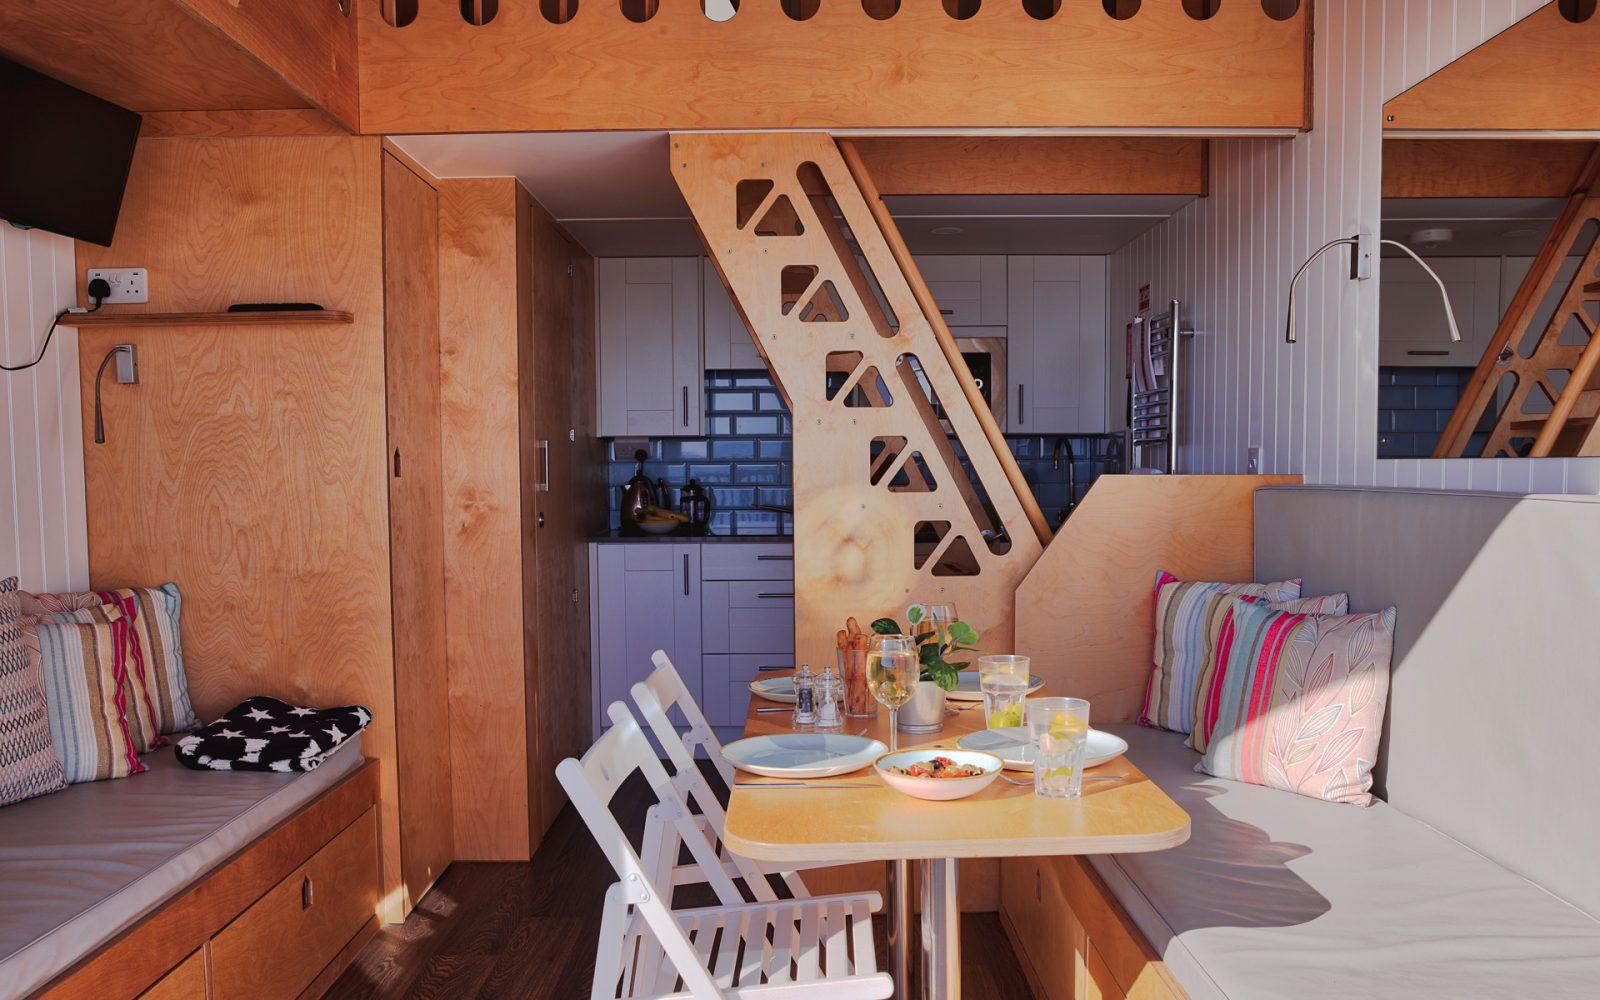 Bournemouth Beach Lodges - Interior